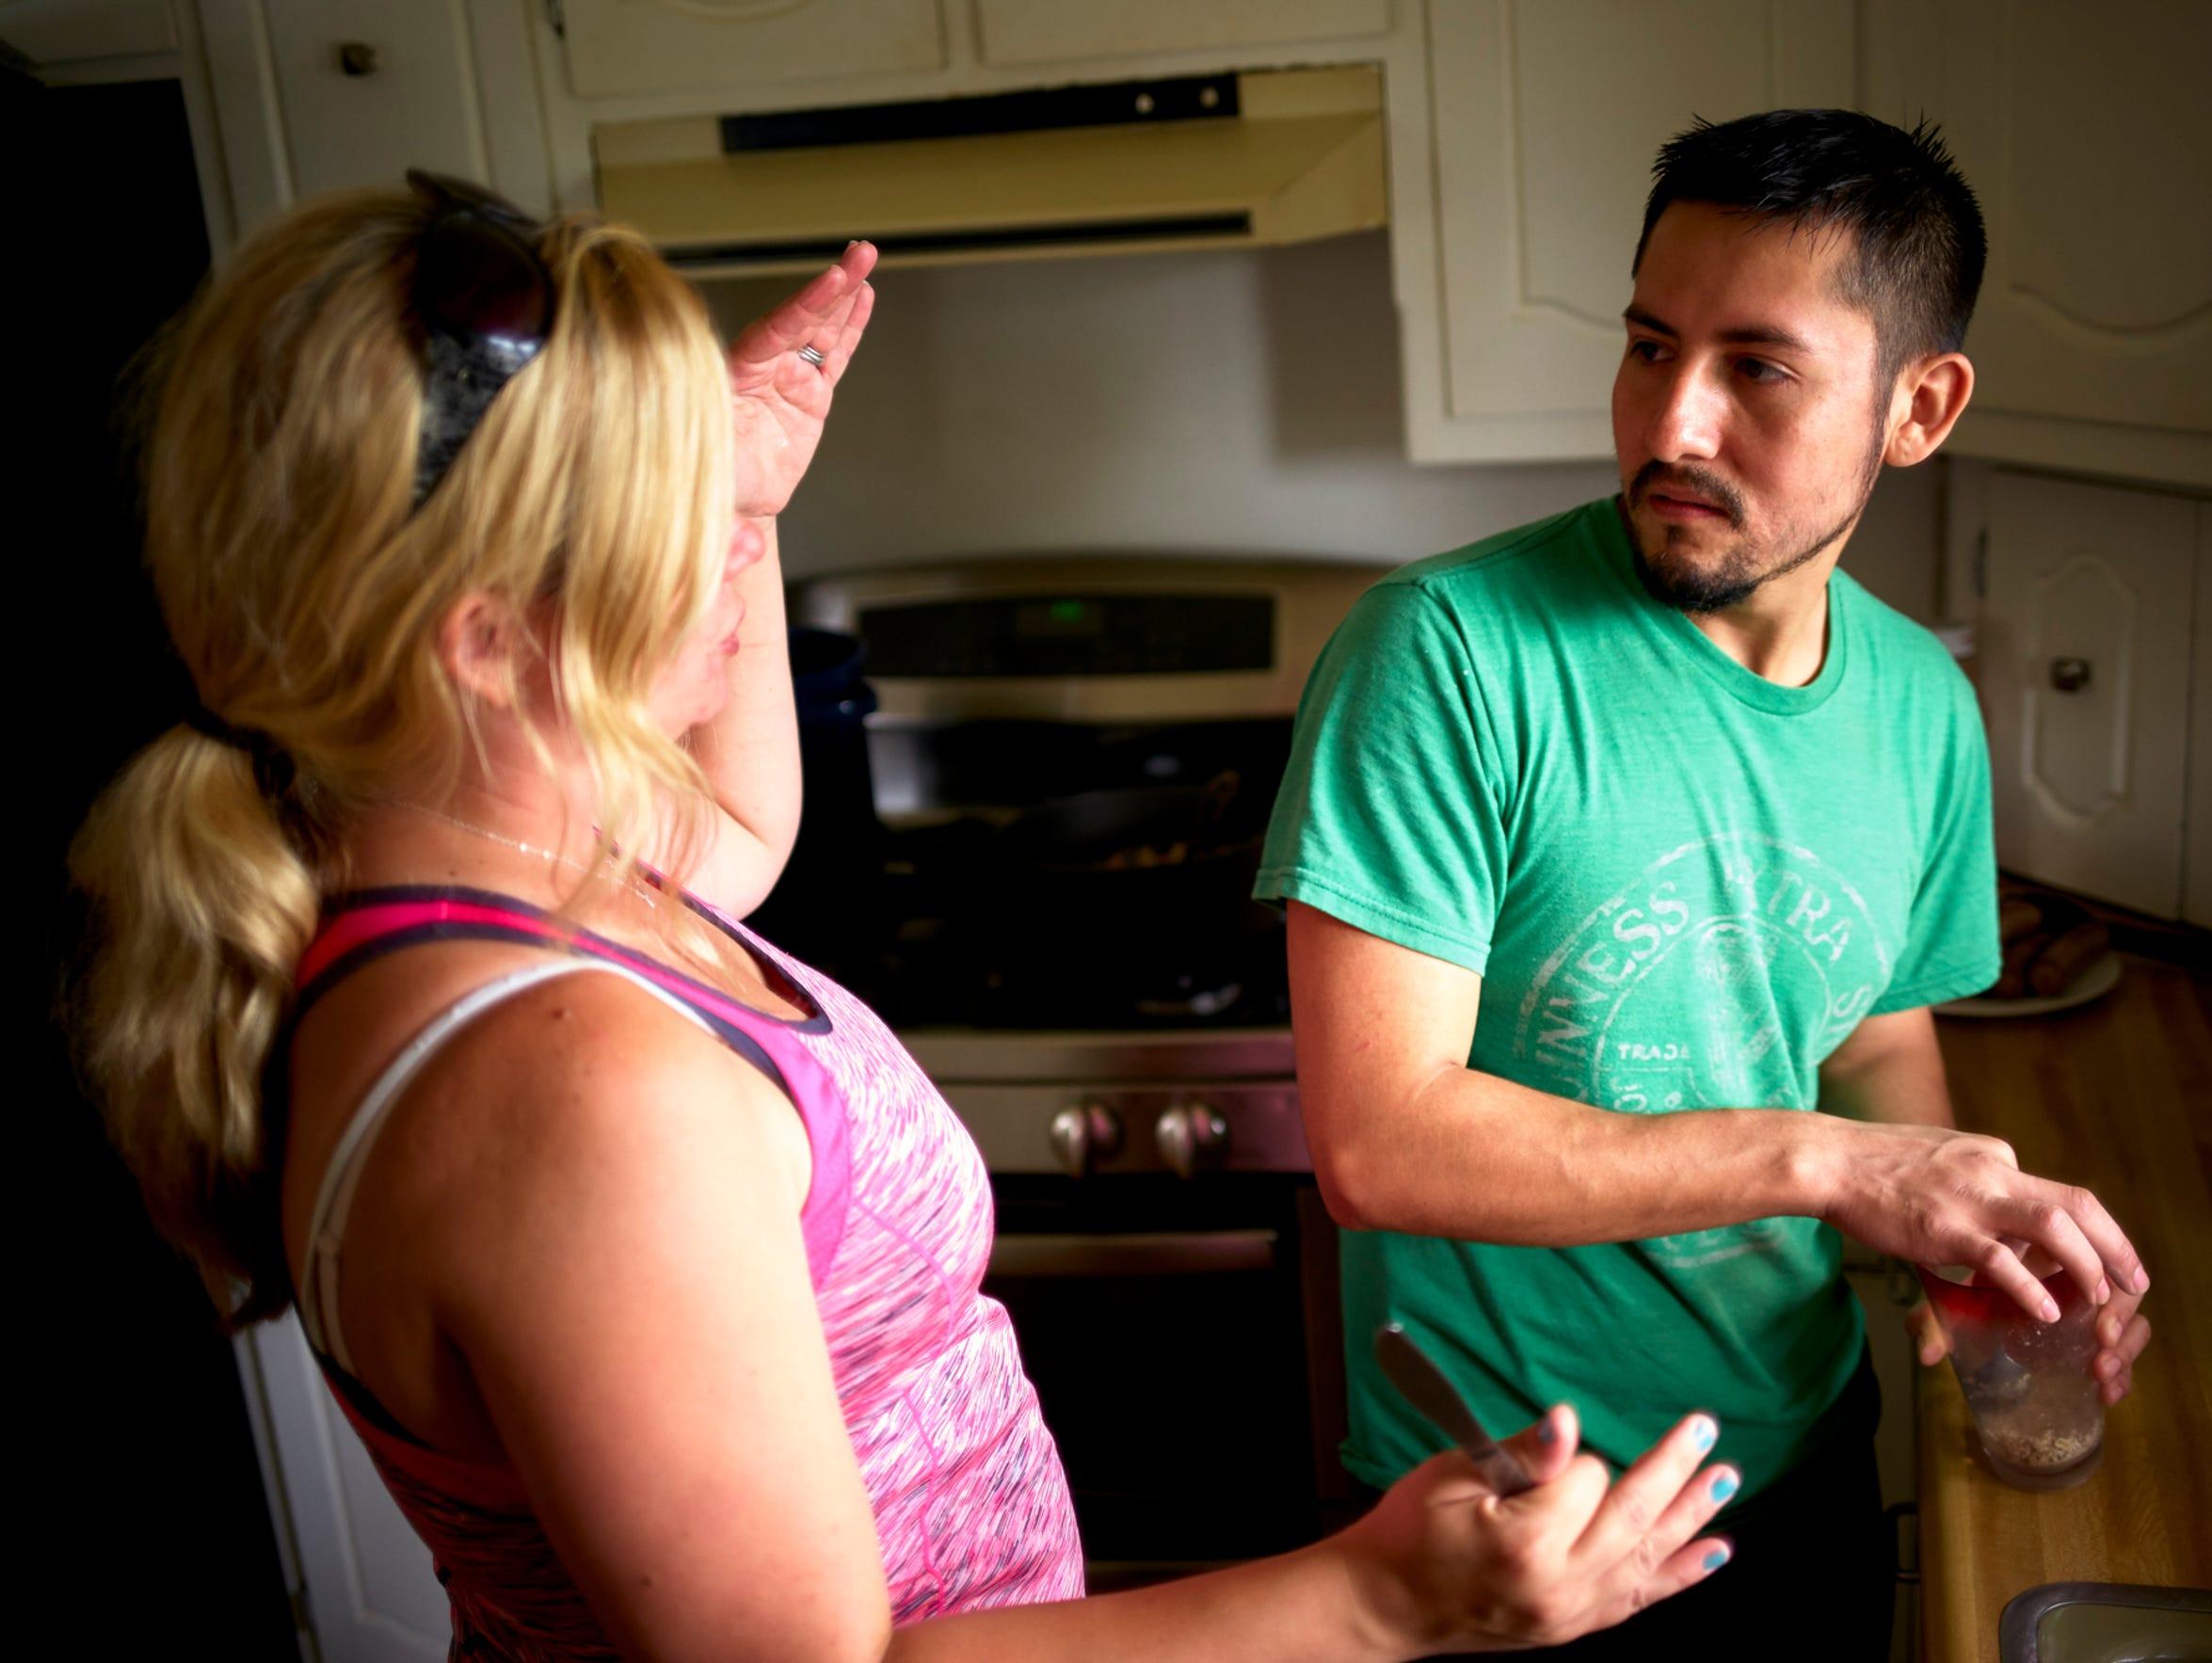 Together, Manuel Estrada and his wife, Jennifer, organize